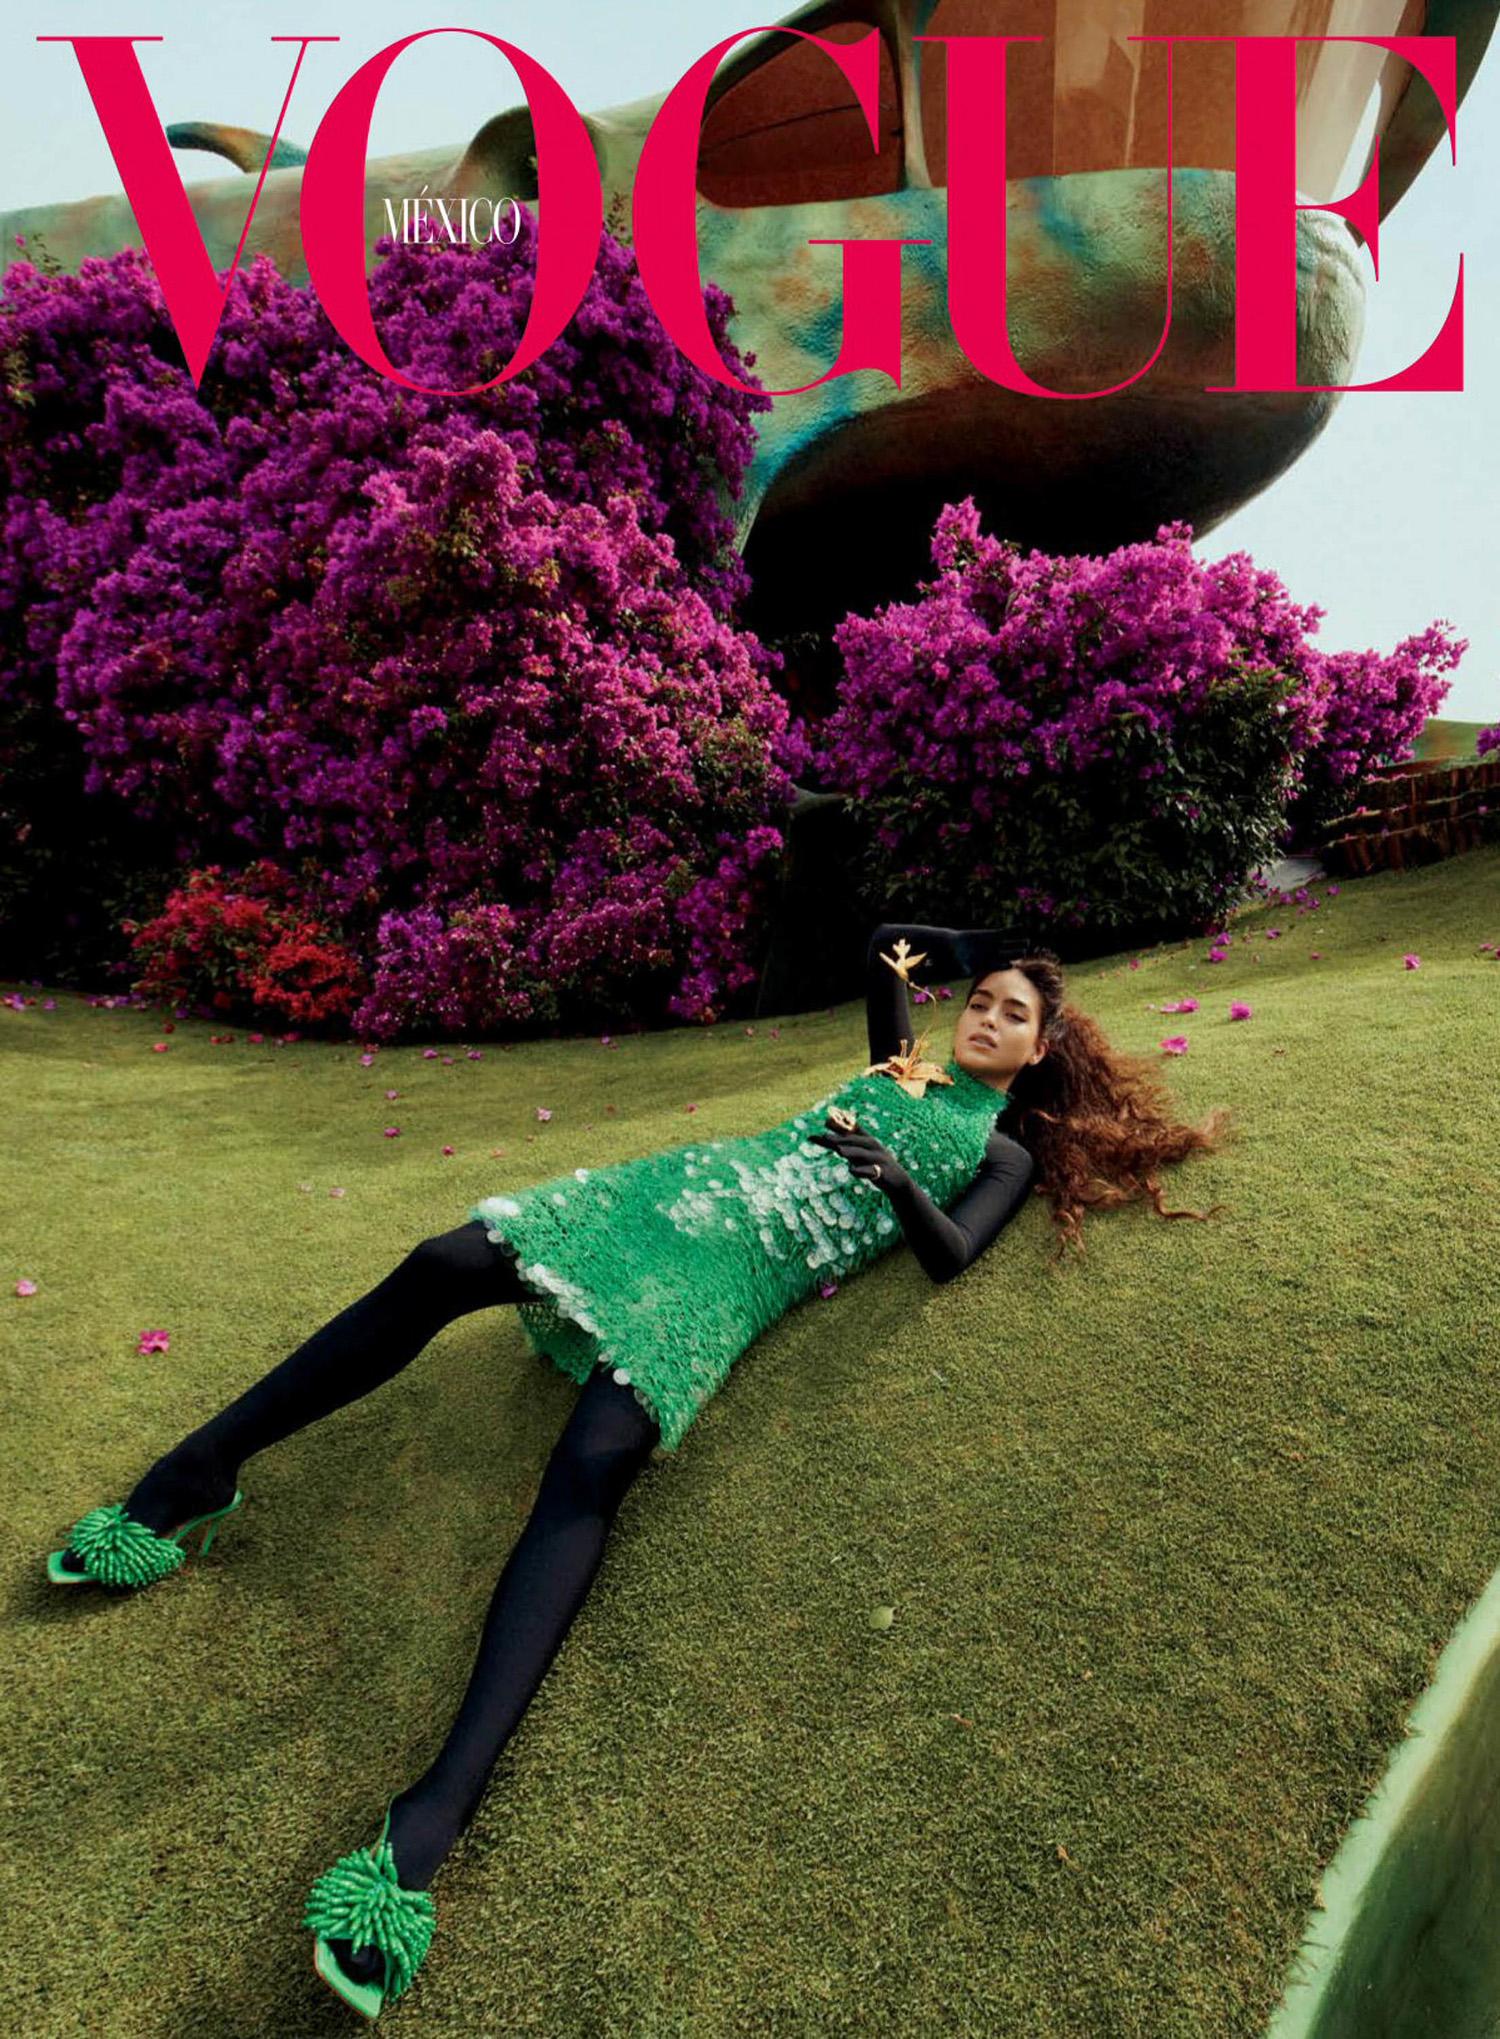 Melissa Barrera covers Vogue Mexico September 2021 by Emma Summerton